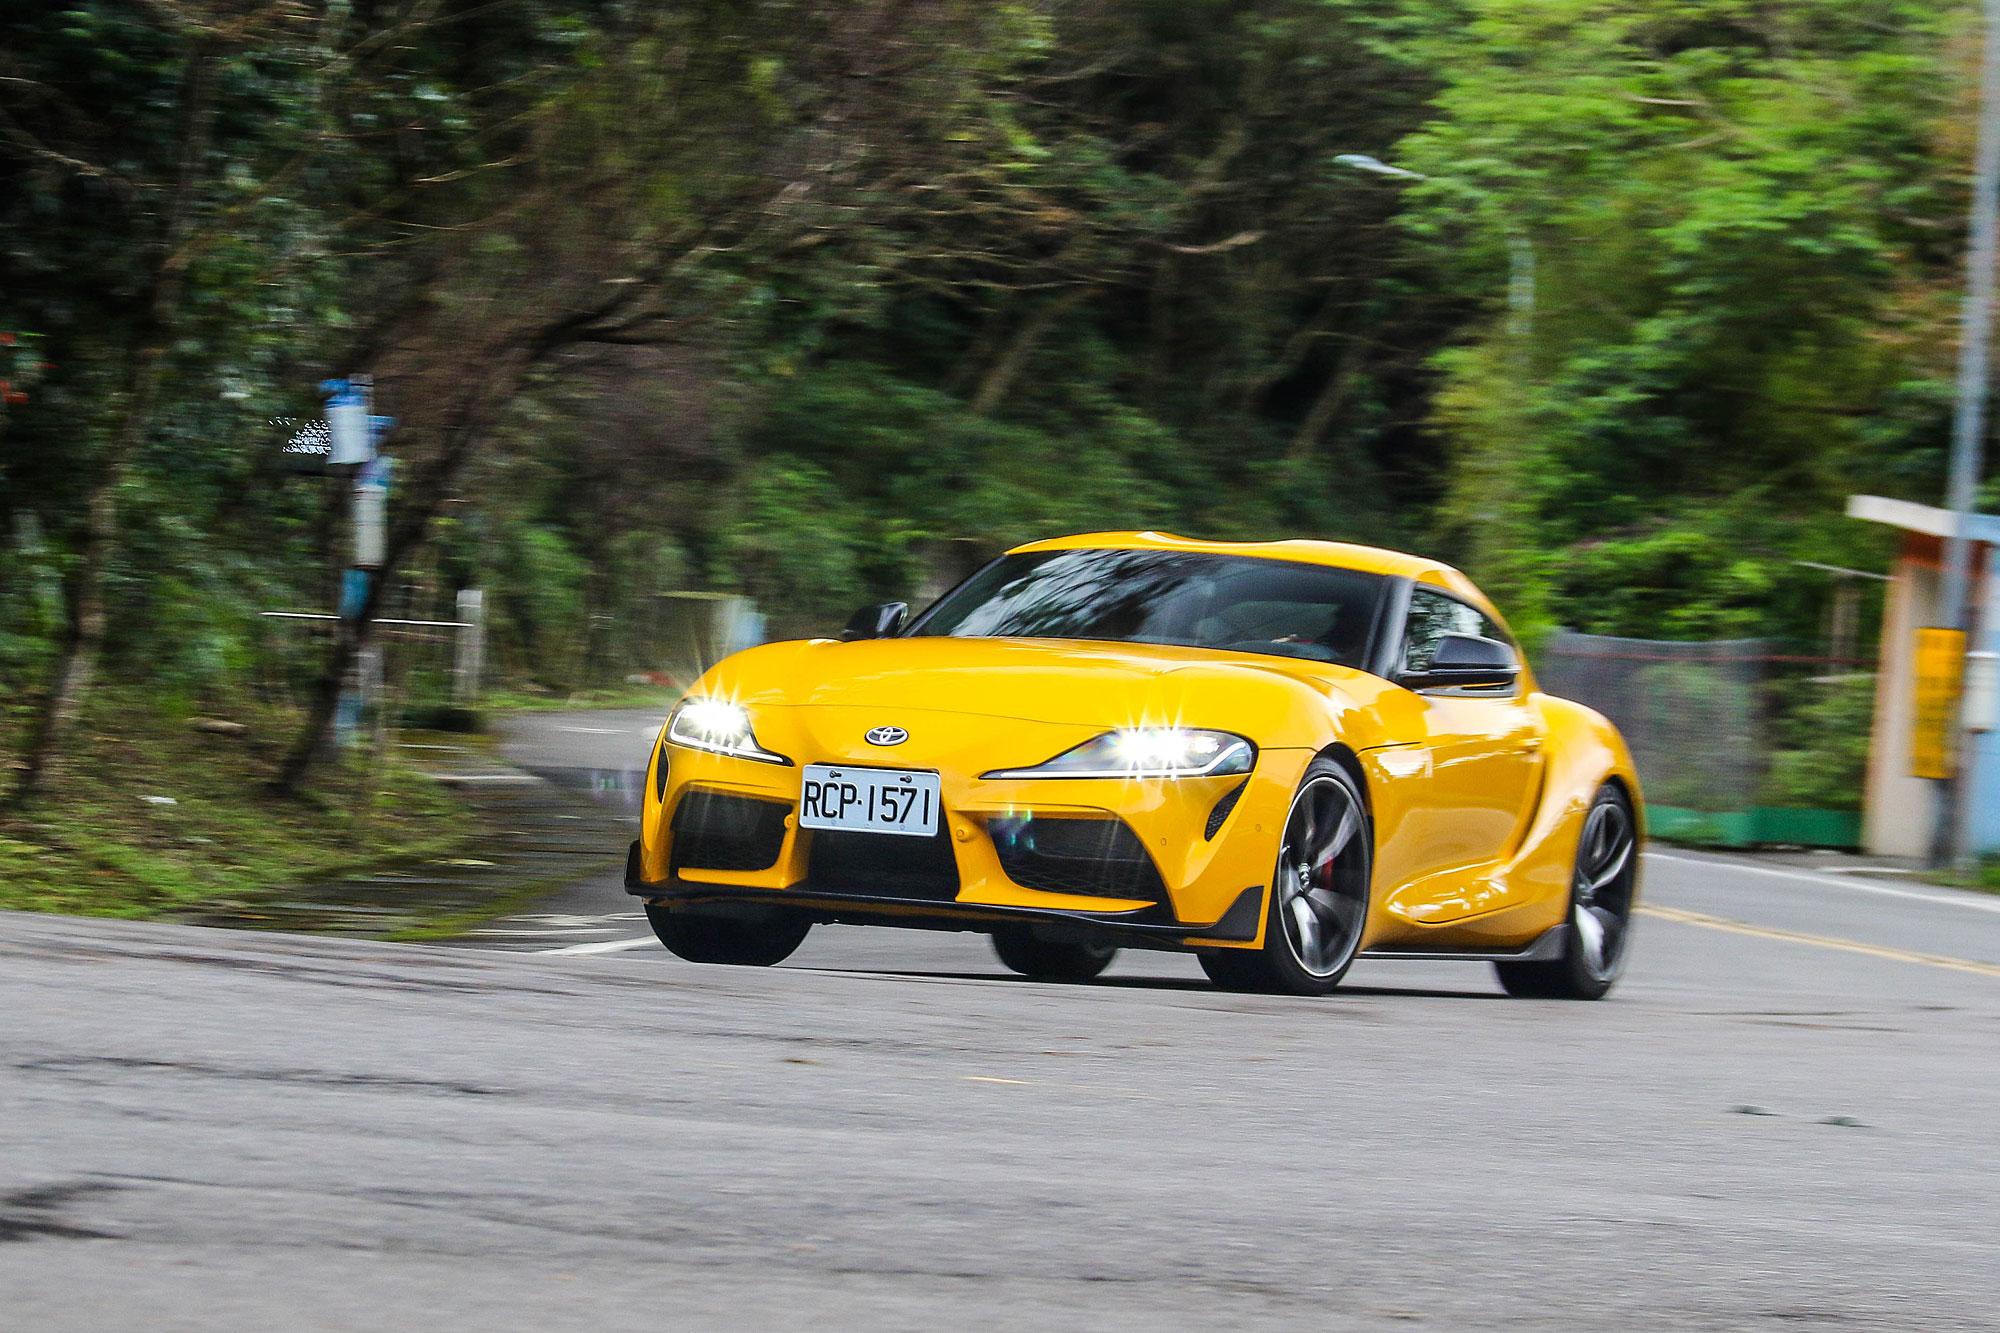 Toyota 近年來產品風格的轉變有目共睹,尤其在幾款跑車與個性化產品之上。